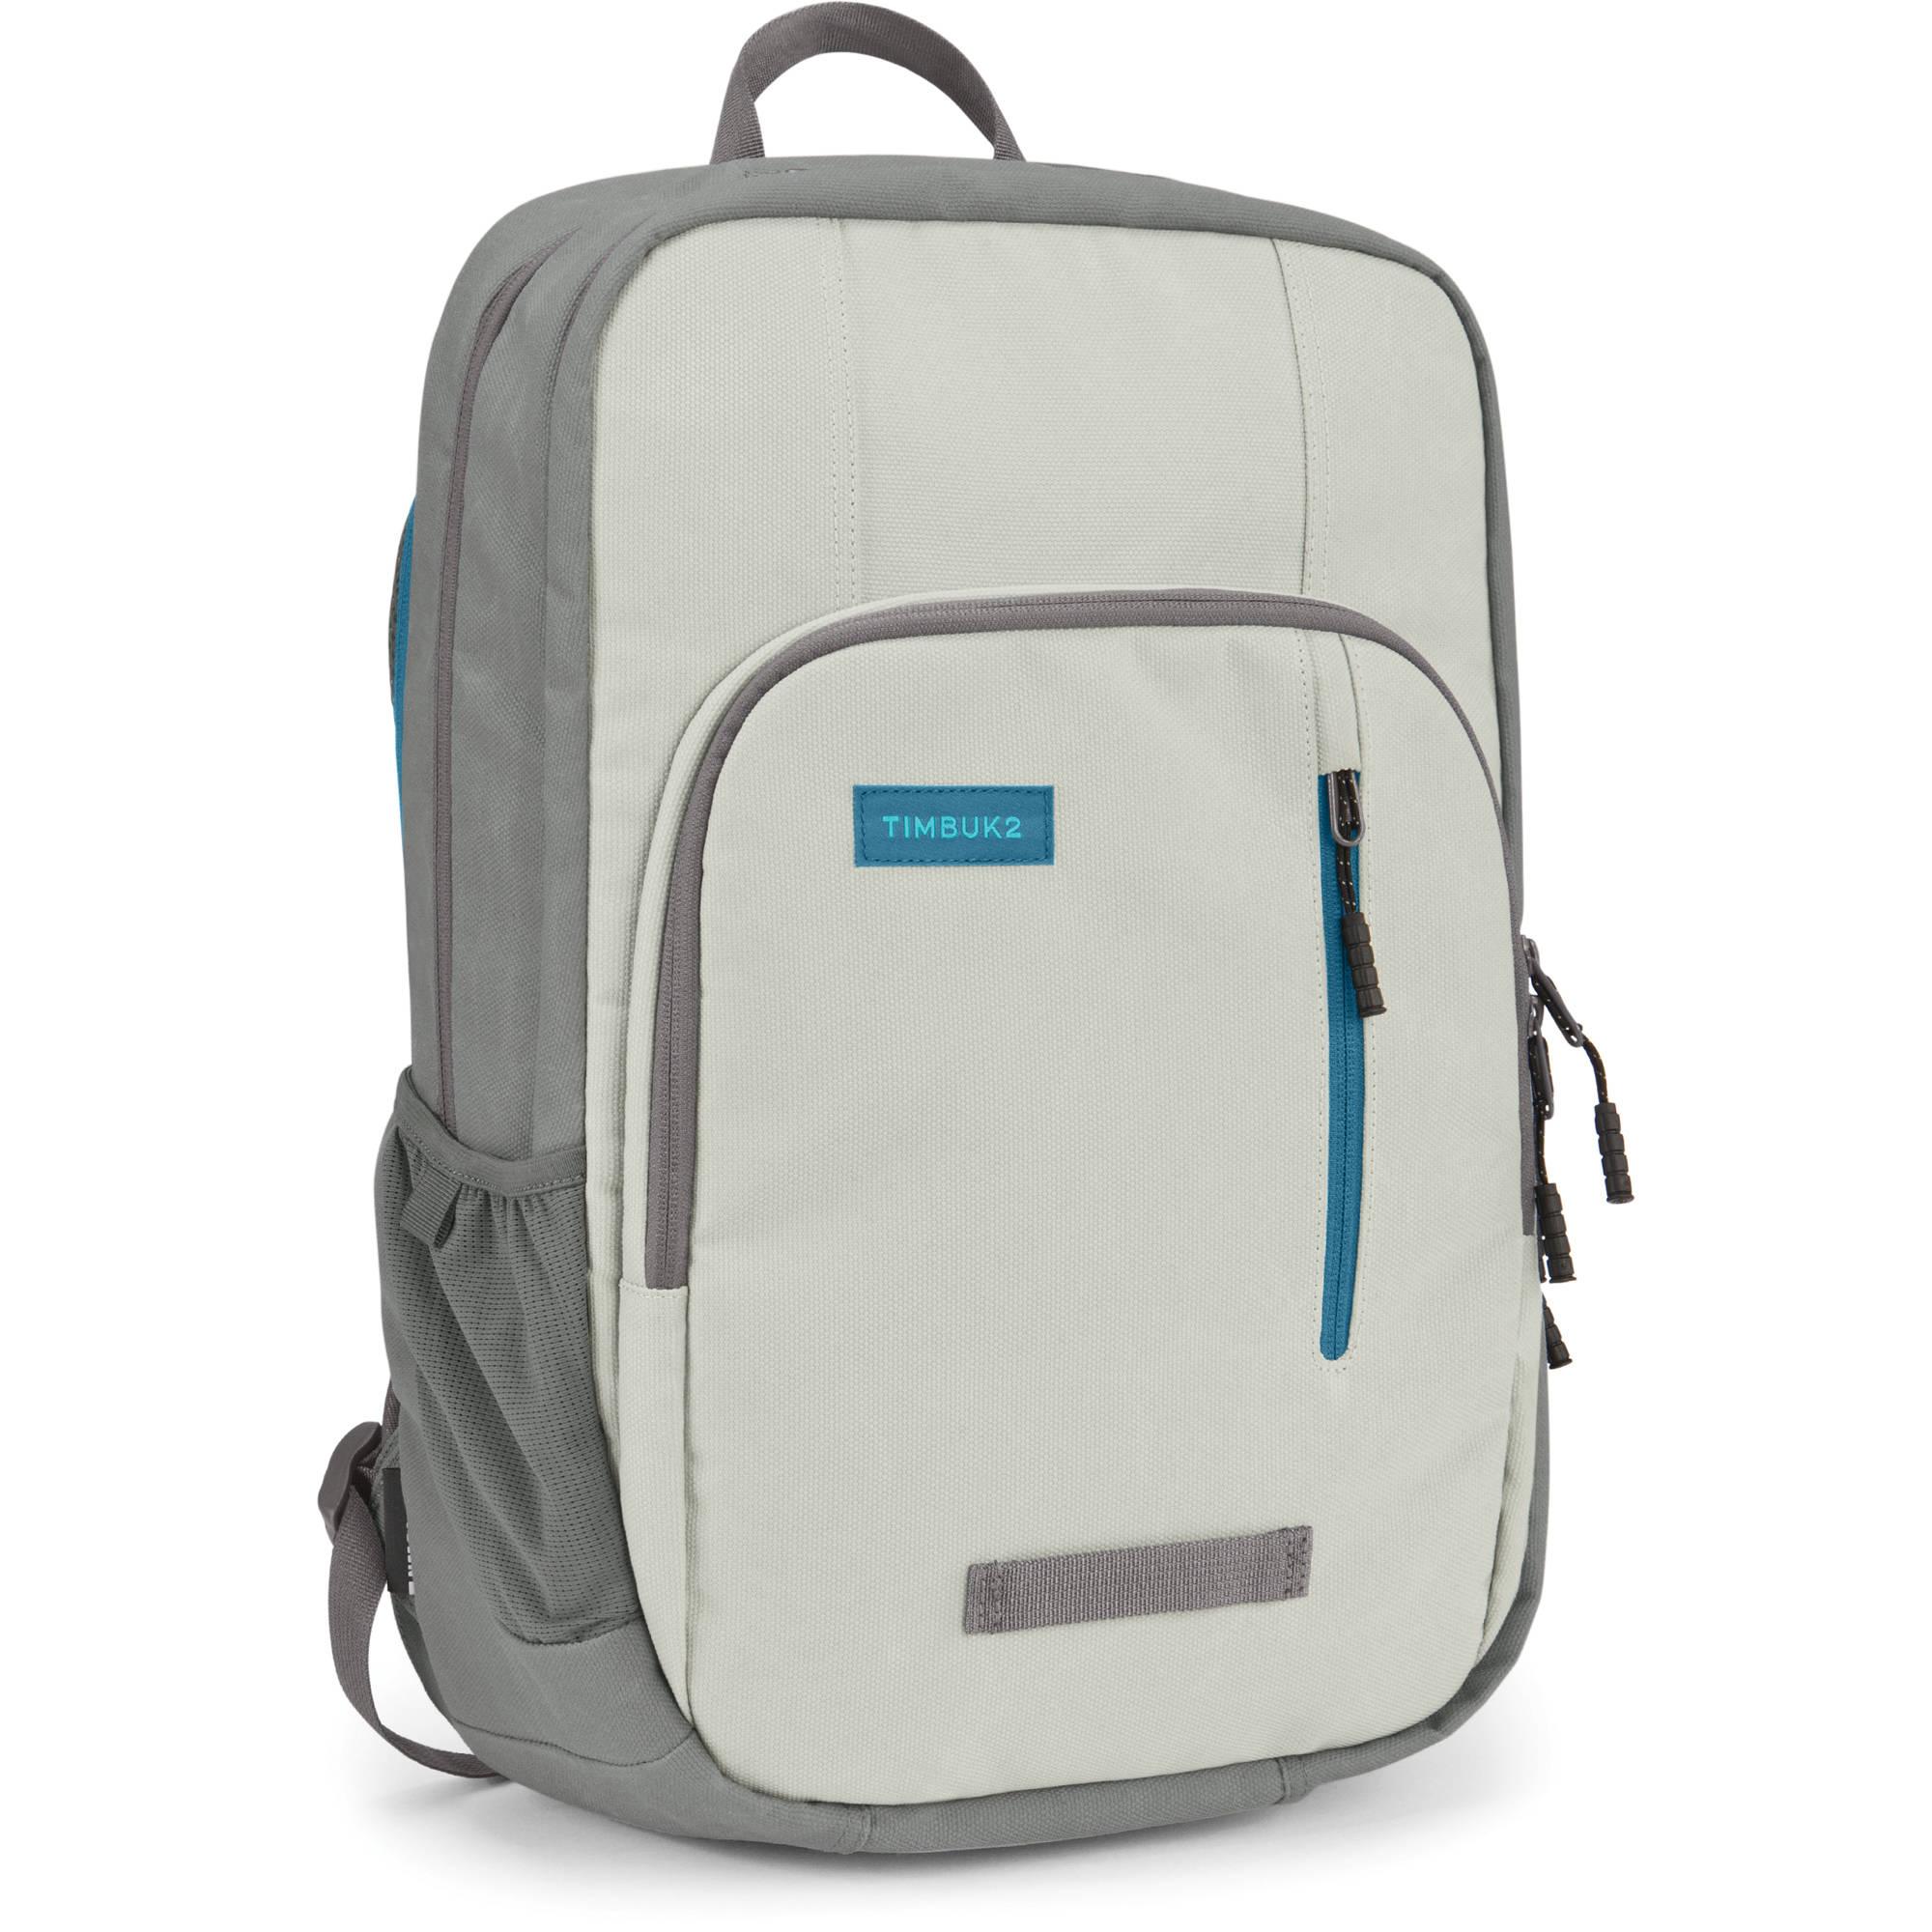 51d1a8bd2ea Timbuk2 Uptown TSA-Friendly Laptop Backpack 2015 (Tropic Limestone)